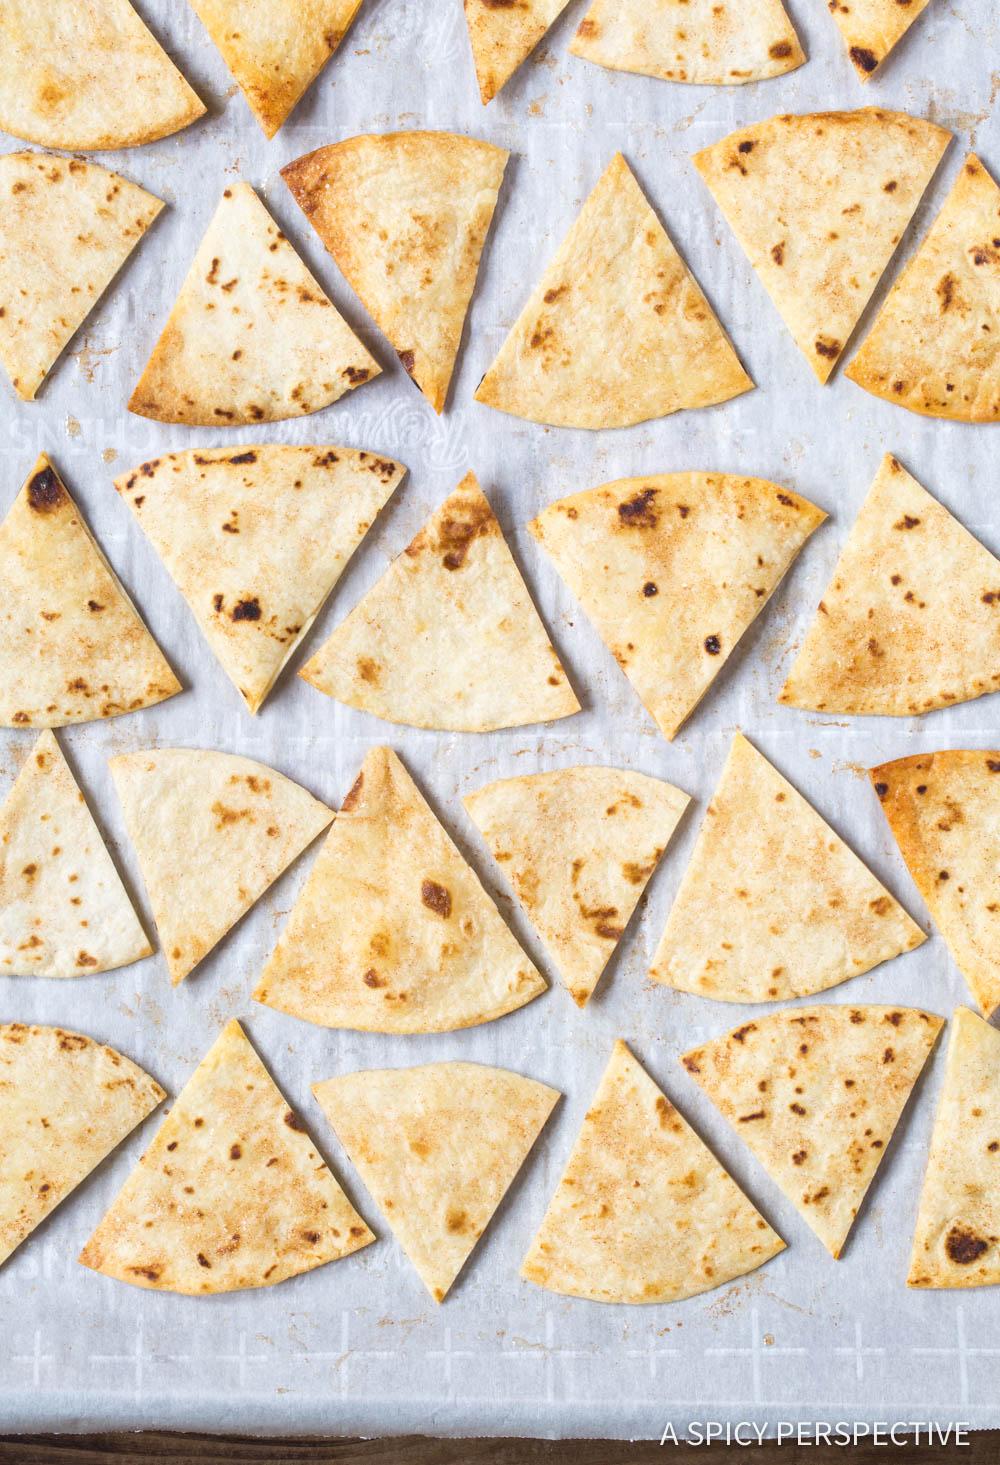 Homemade Cinnamon Chips Recipe #ASpicyPerspective #Halloween #Thanksgiving